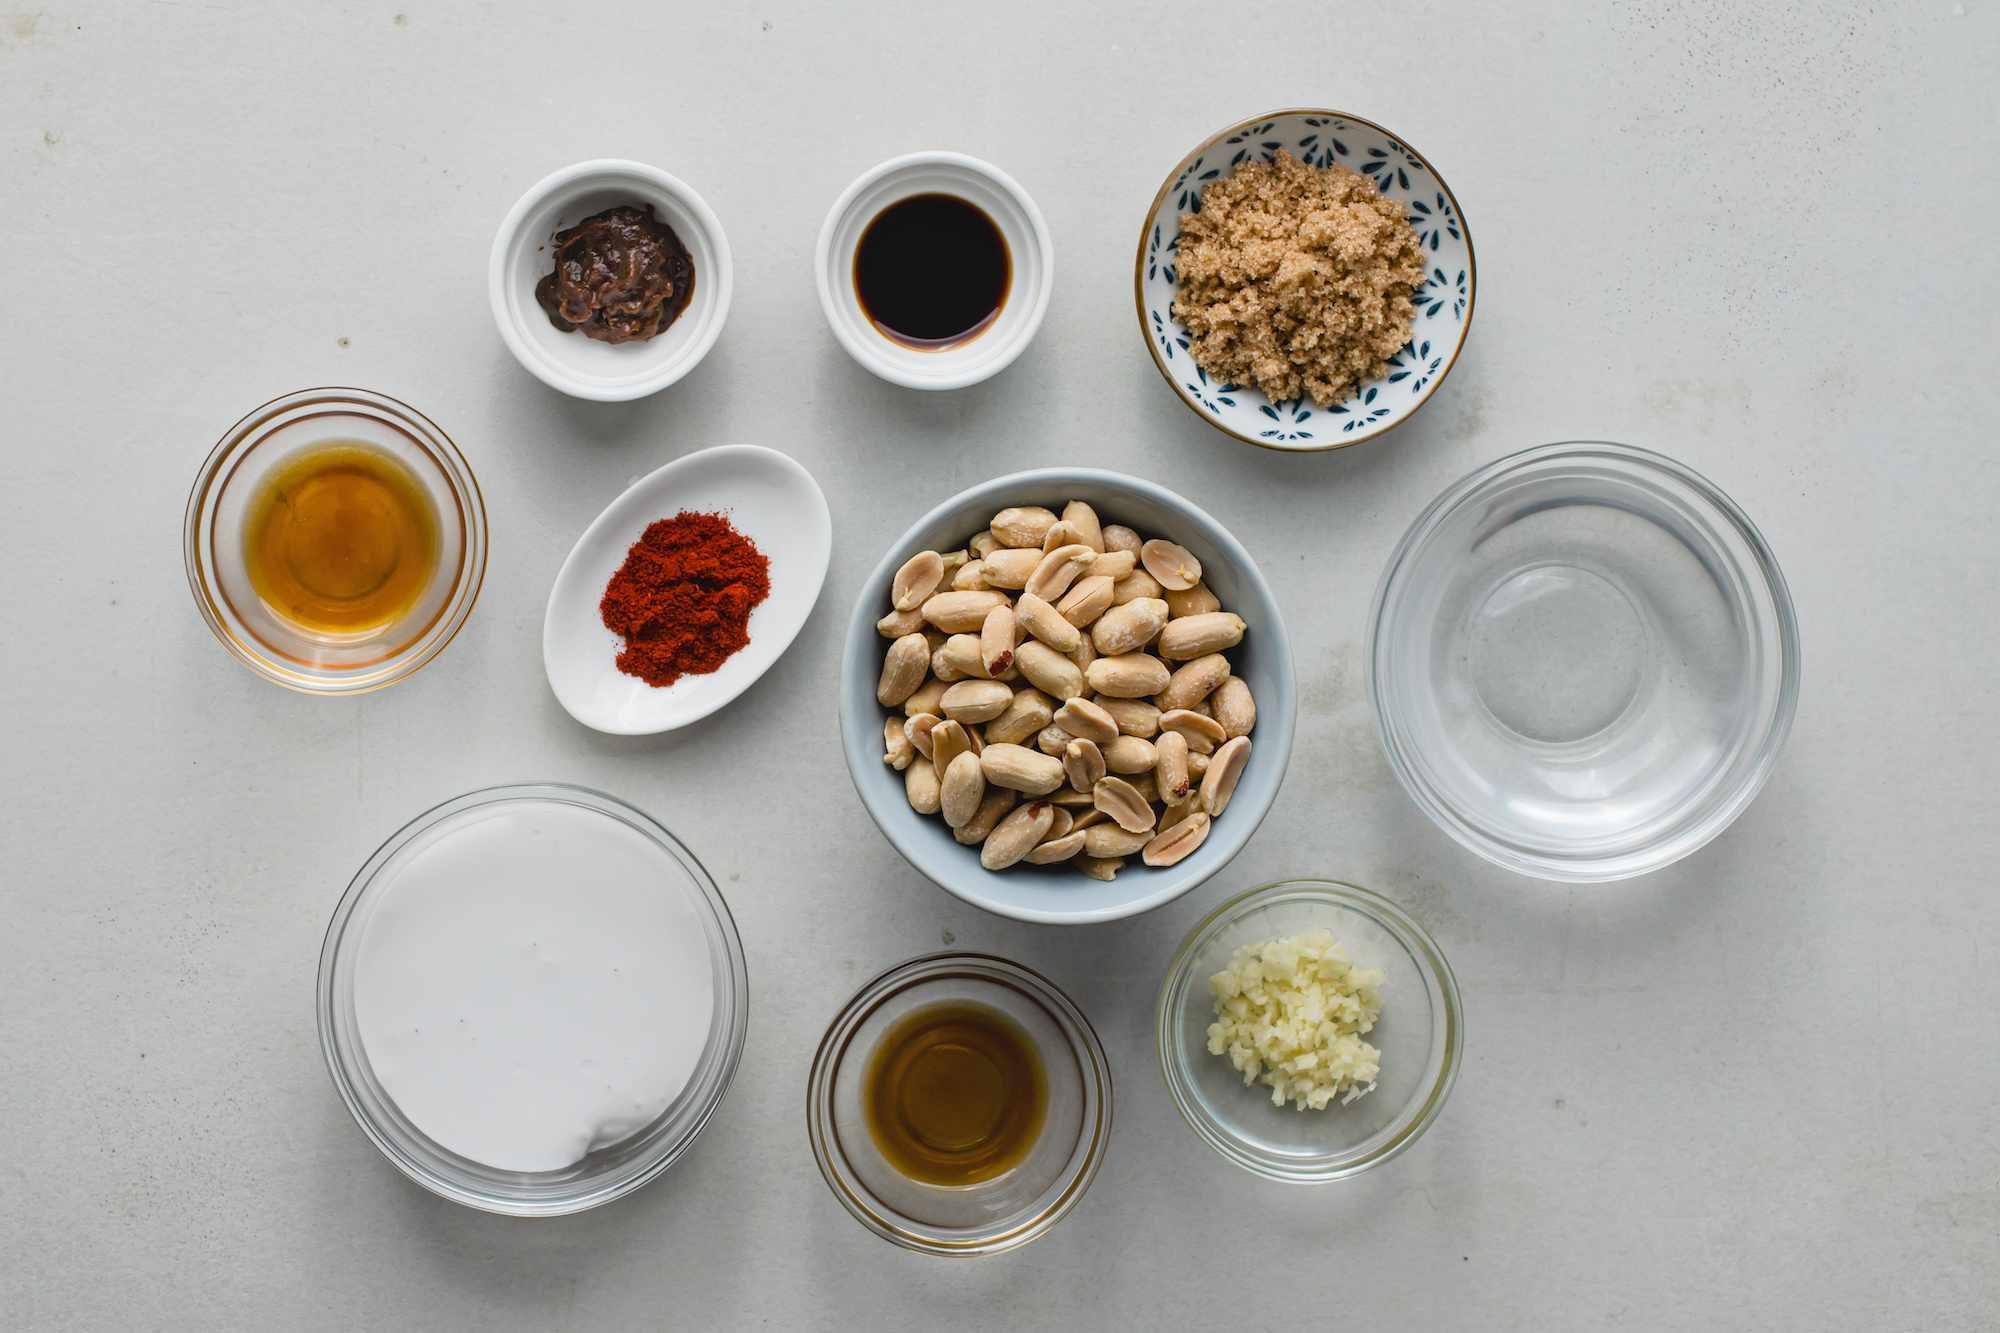 Ingredients for satay peanut sauce